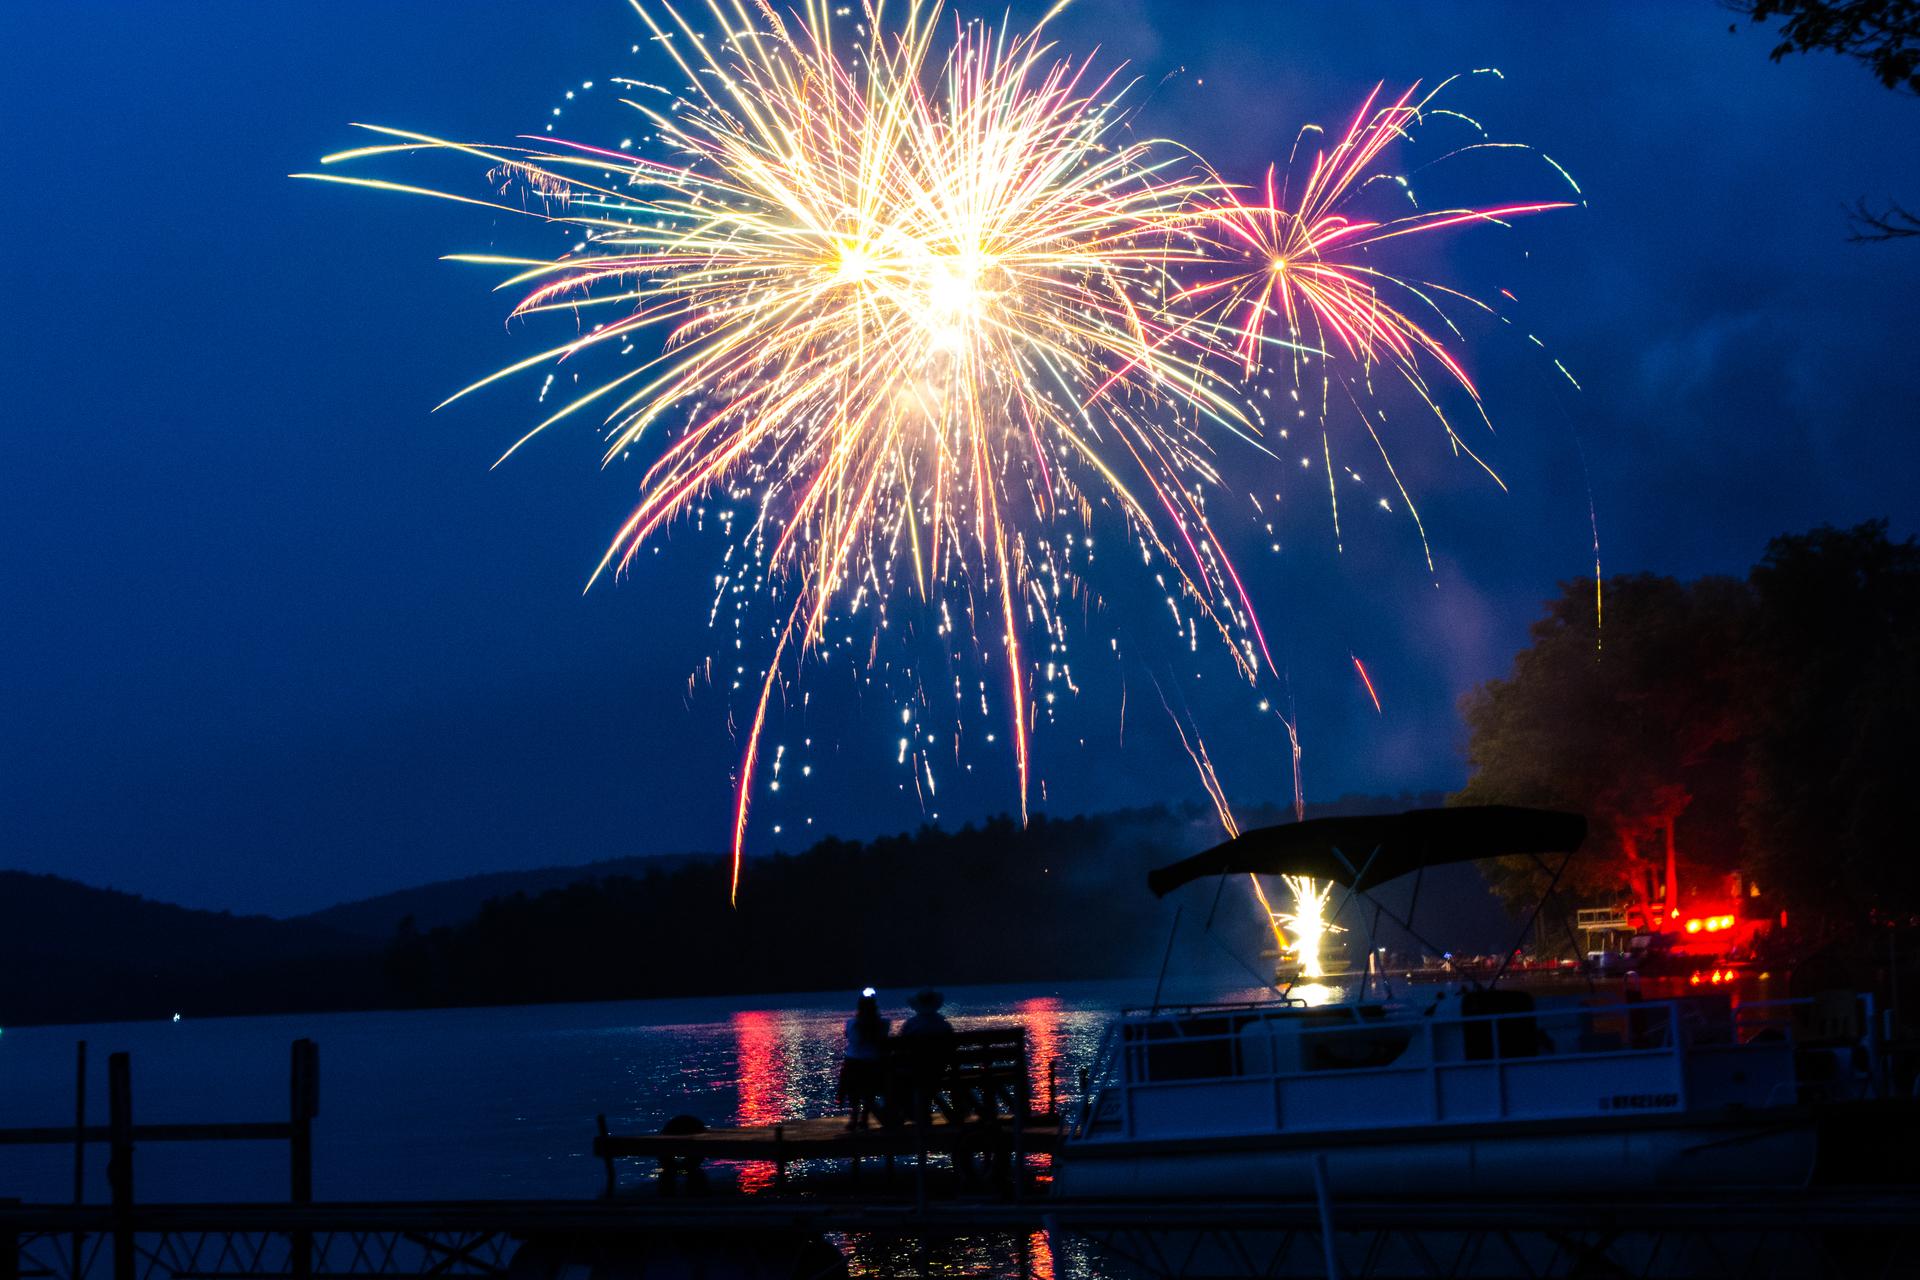 Finger Lakes Fireworks. Finger Lakes Fireworks